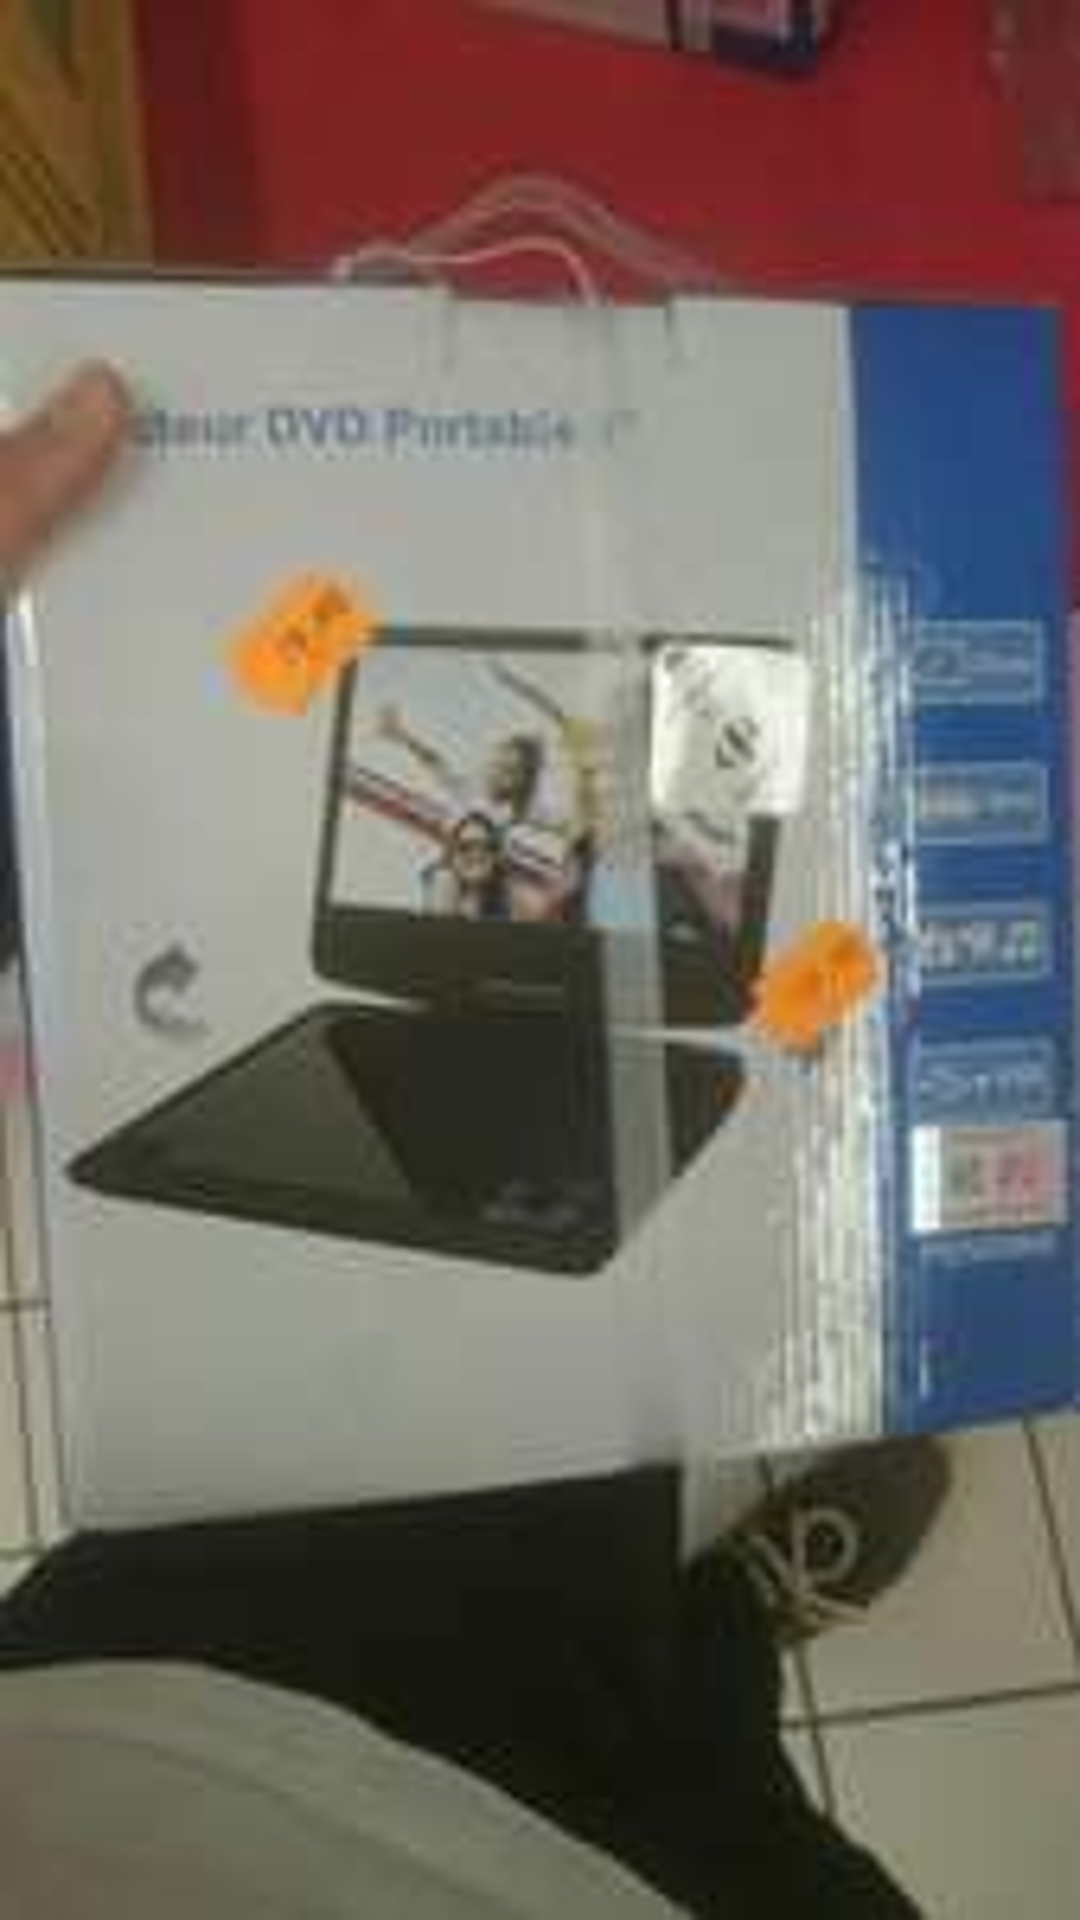 Lecteur DVD portable Netgreen PDVD969